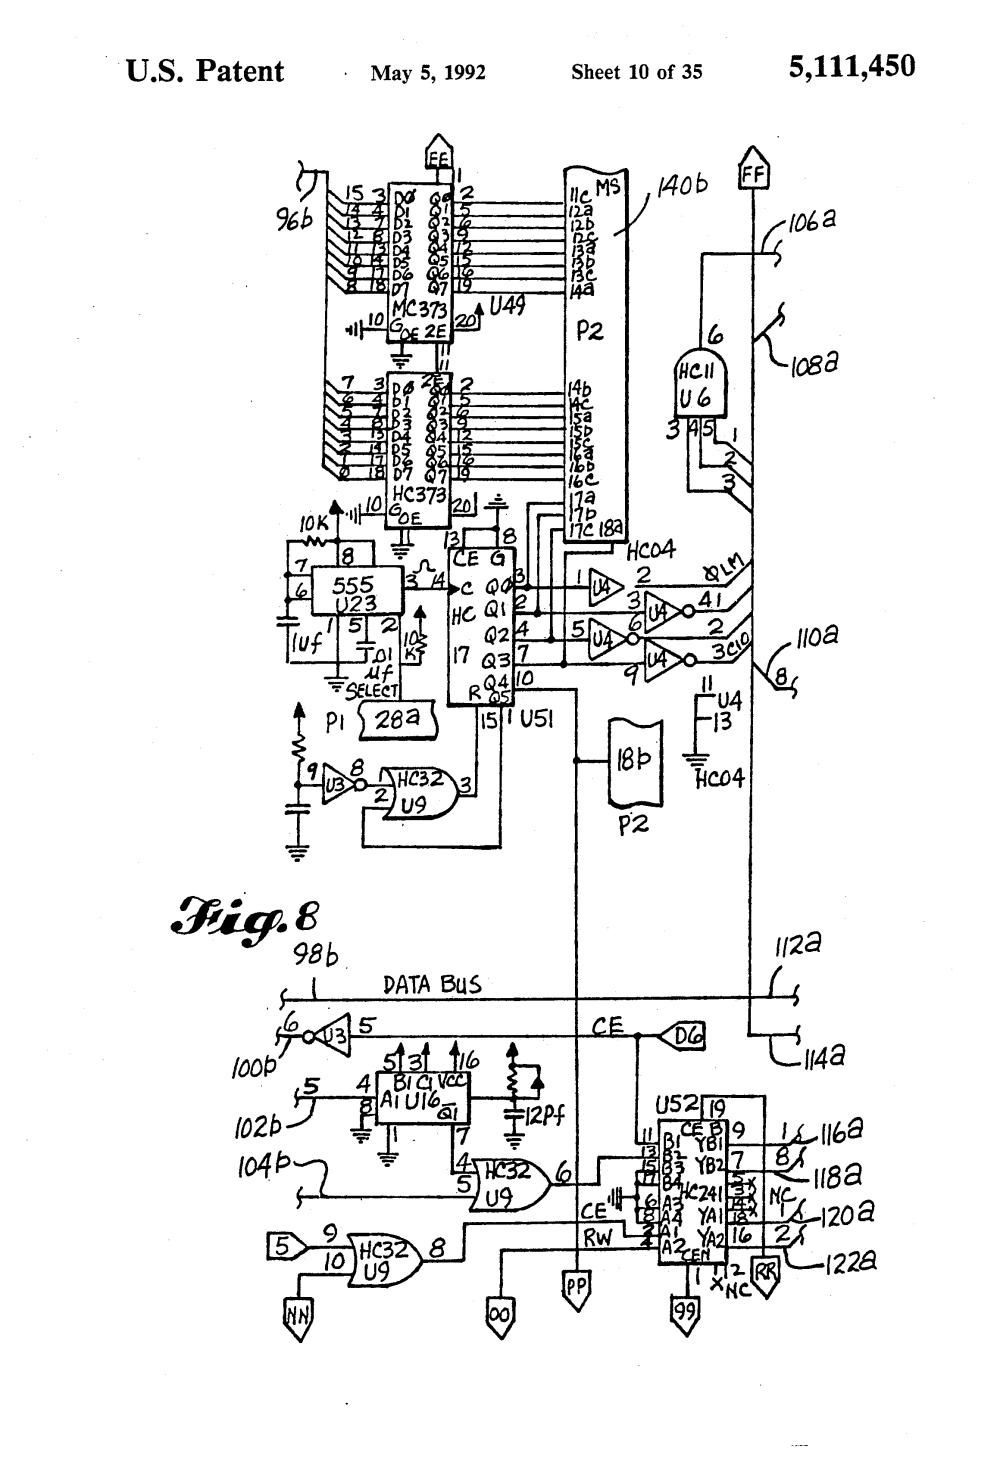 medium resolution of 2003 mitsubishi outlander wiring diagram clutch html 2003 mitsubishi outlander engine diagram 2008 mitsubishi outlander engine